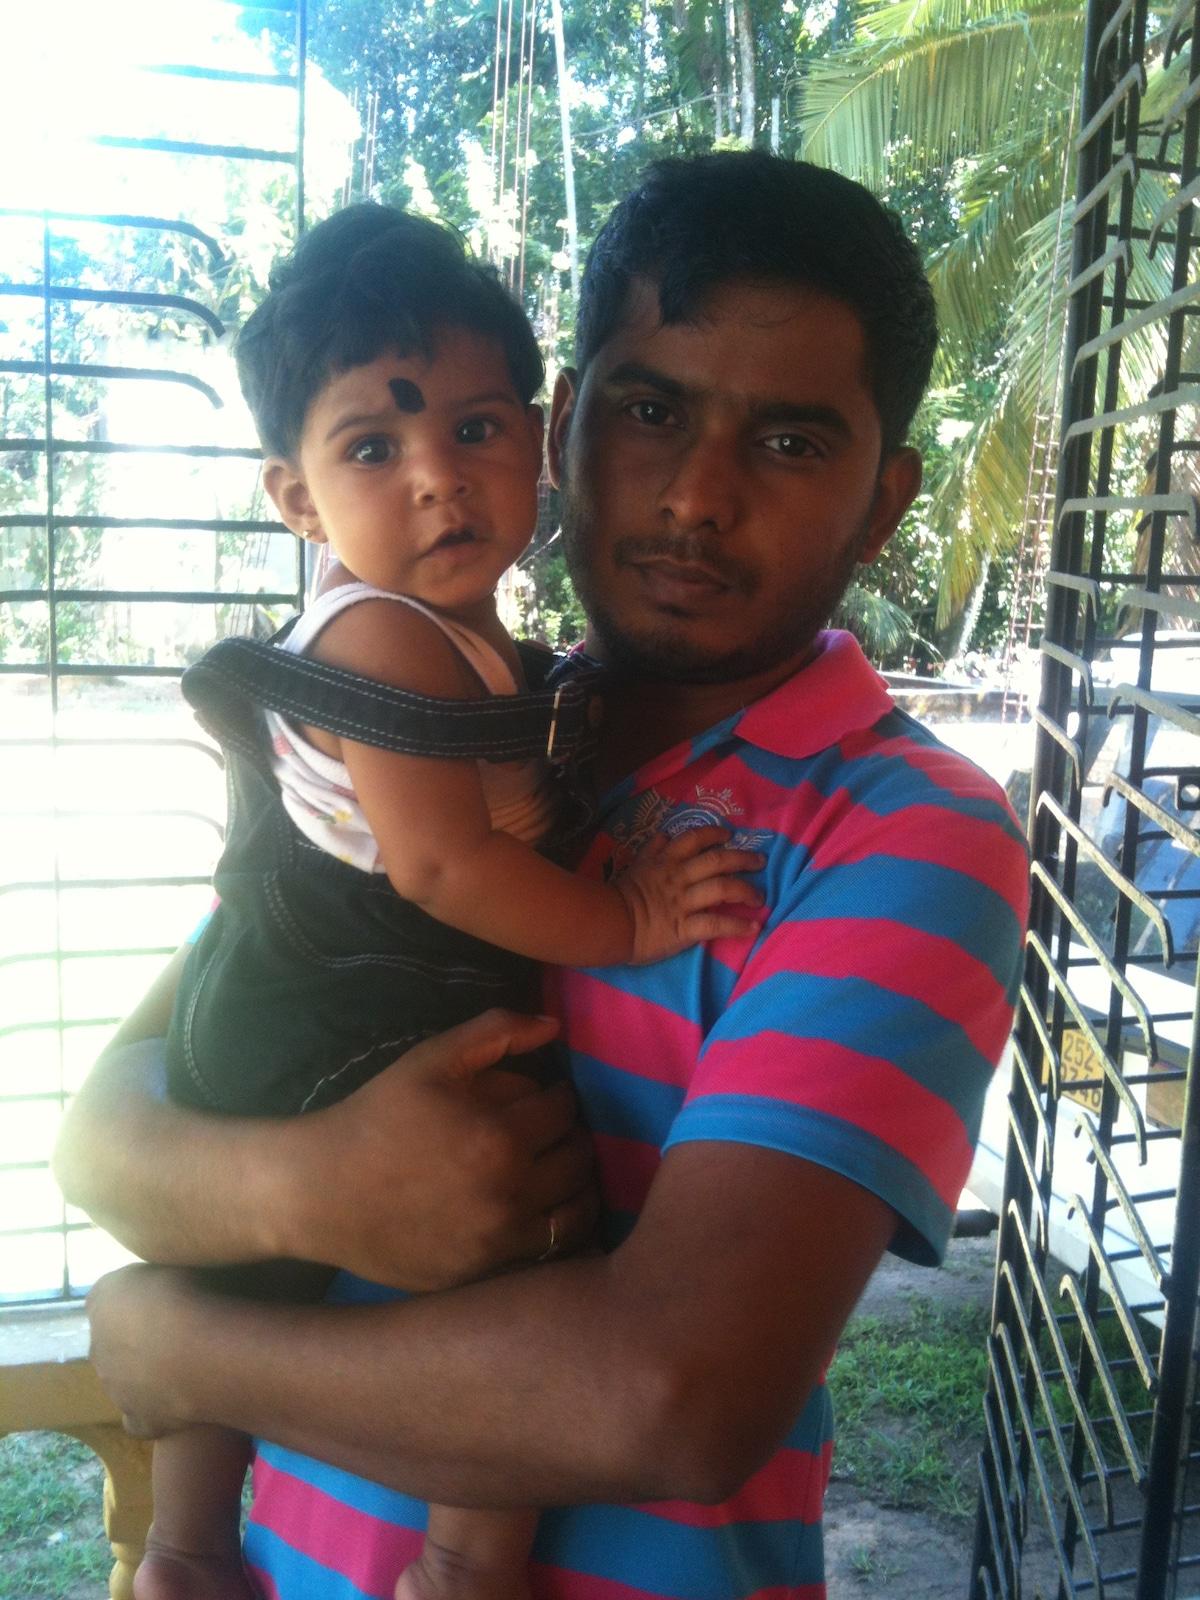 Aruna Shantha from Negombo